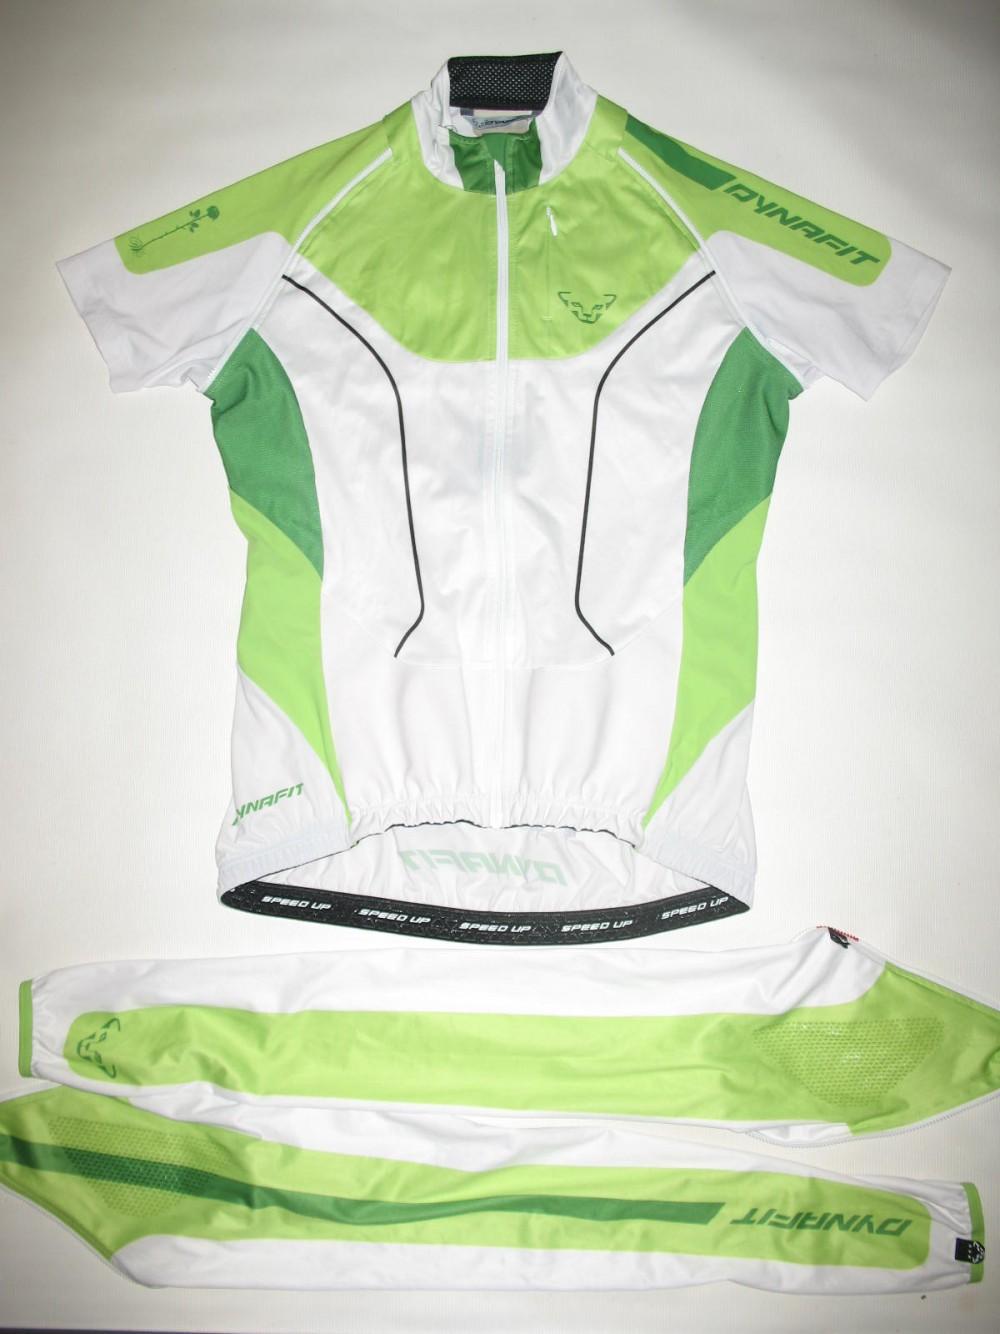 Велокуртка DYNAFIT transalper 2in1 conver bike/run jacket lady (размер M/S) - 2